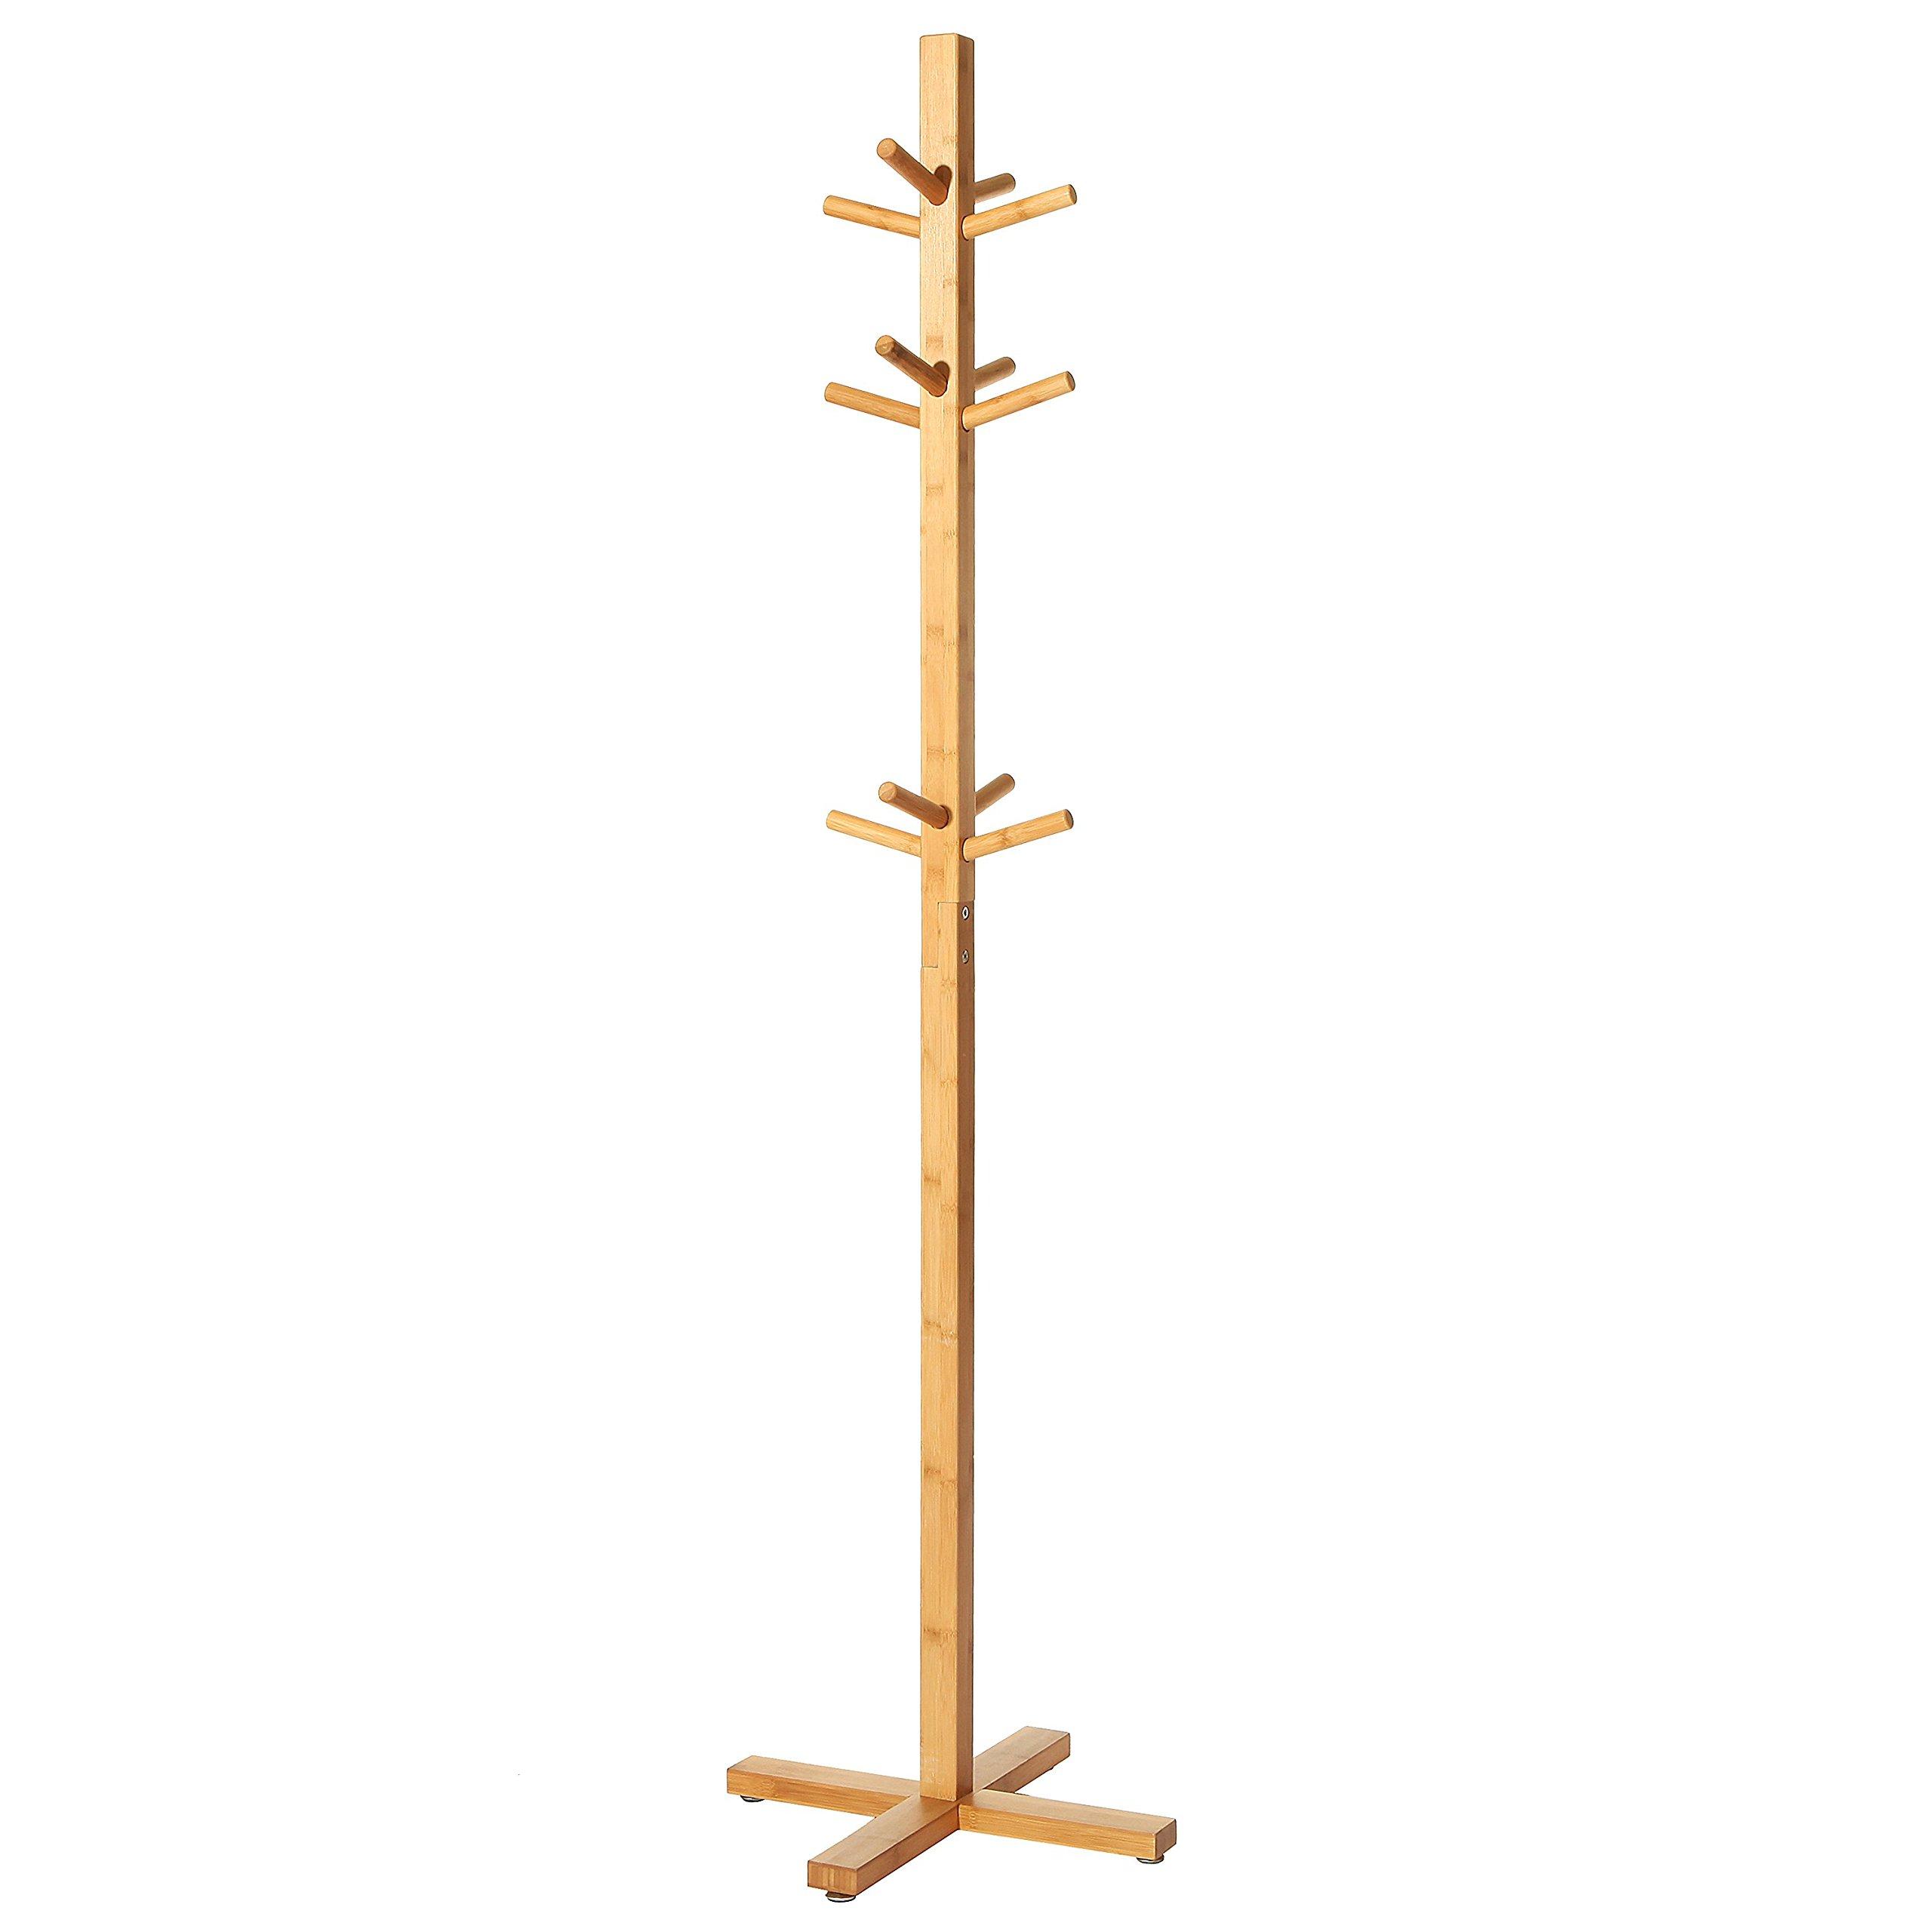 MyGift Freestanding Entryway Bamboo Wood 12 Hook Garment/Tree Rack/Hallway Coat & Hat Stand